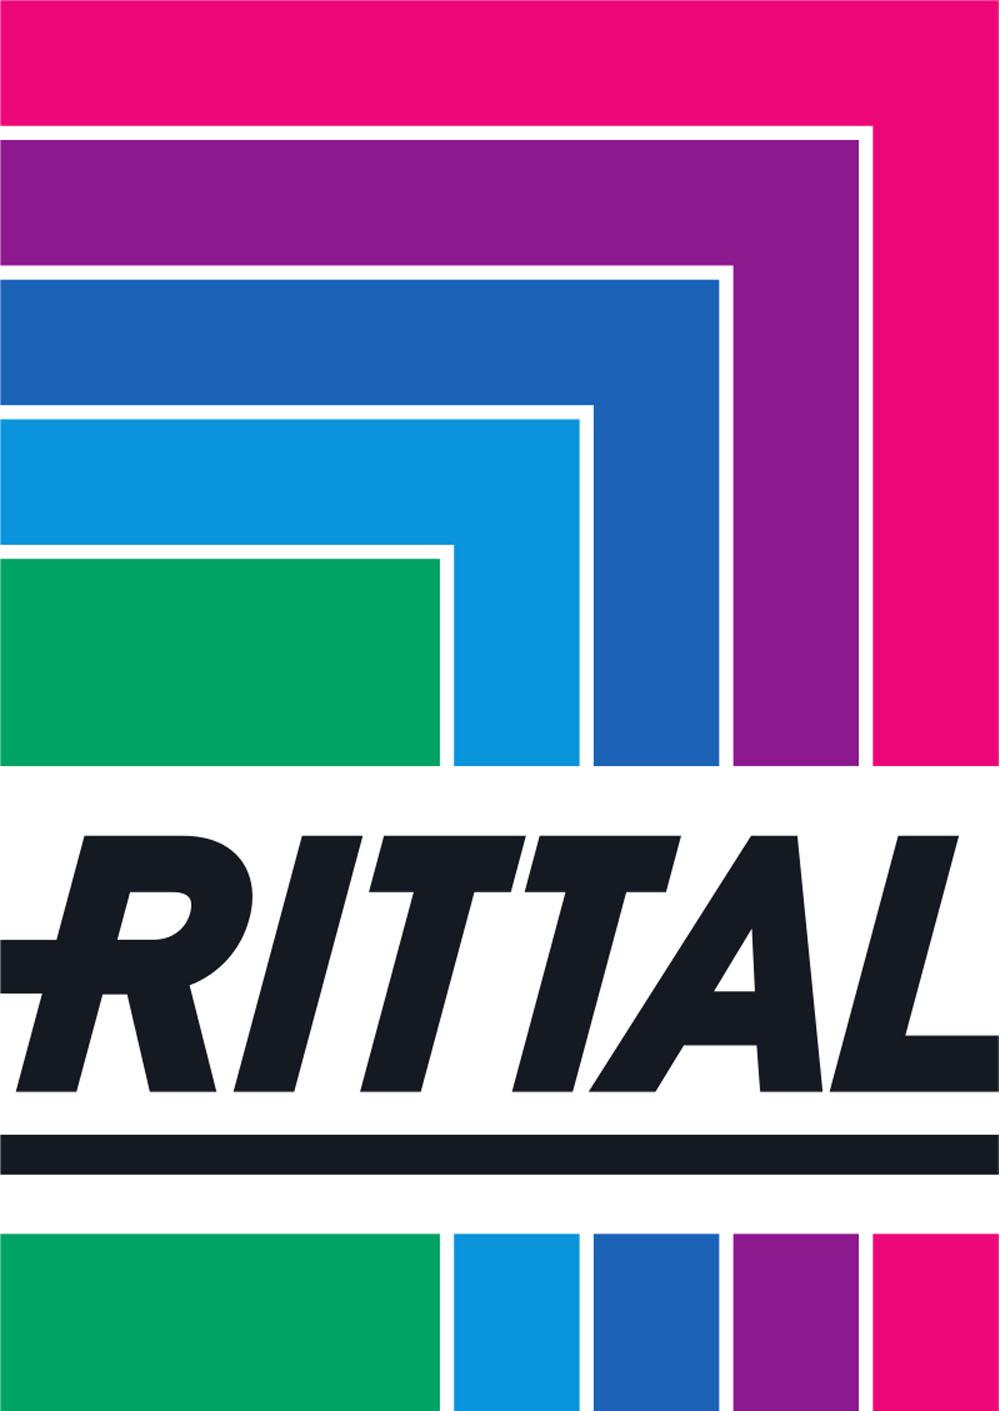 Rittal Komfortgriff RAL9005 TS 8611.360 Schaltschranksysteme 8611360